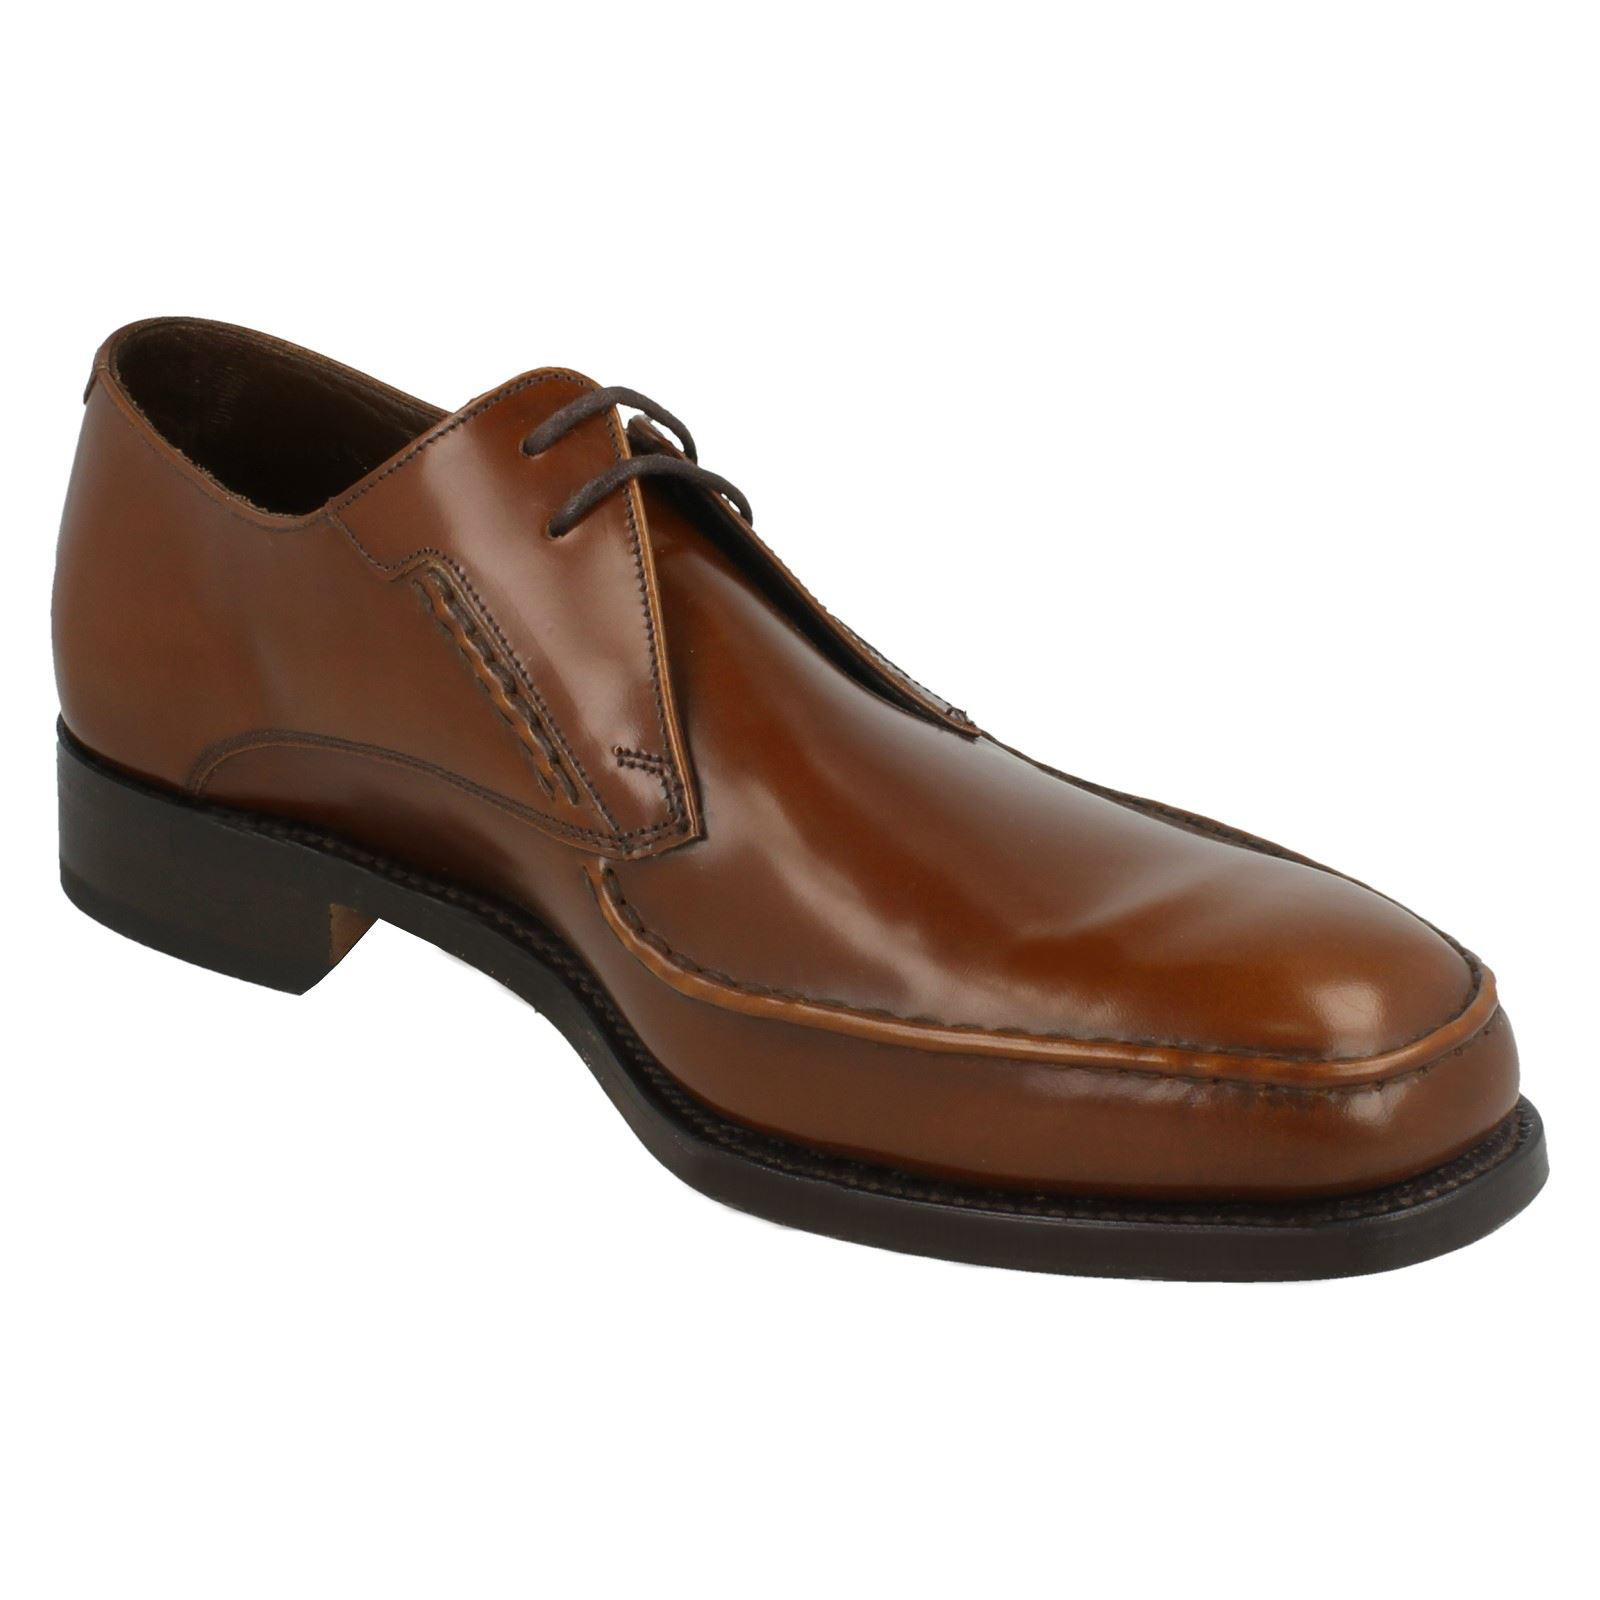 Uomo Formal Schuhes Barker Barker Barker Pitney 7fdb0c